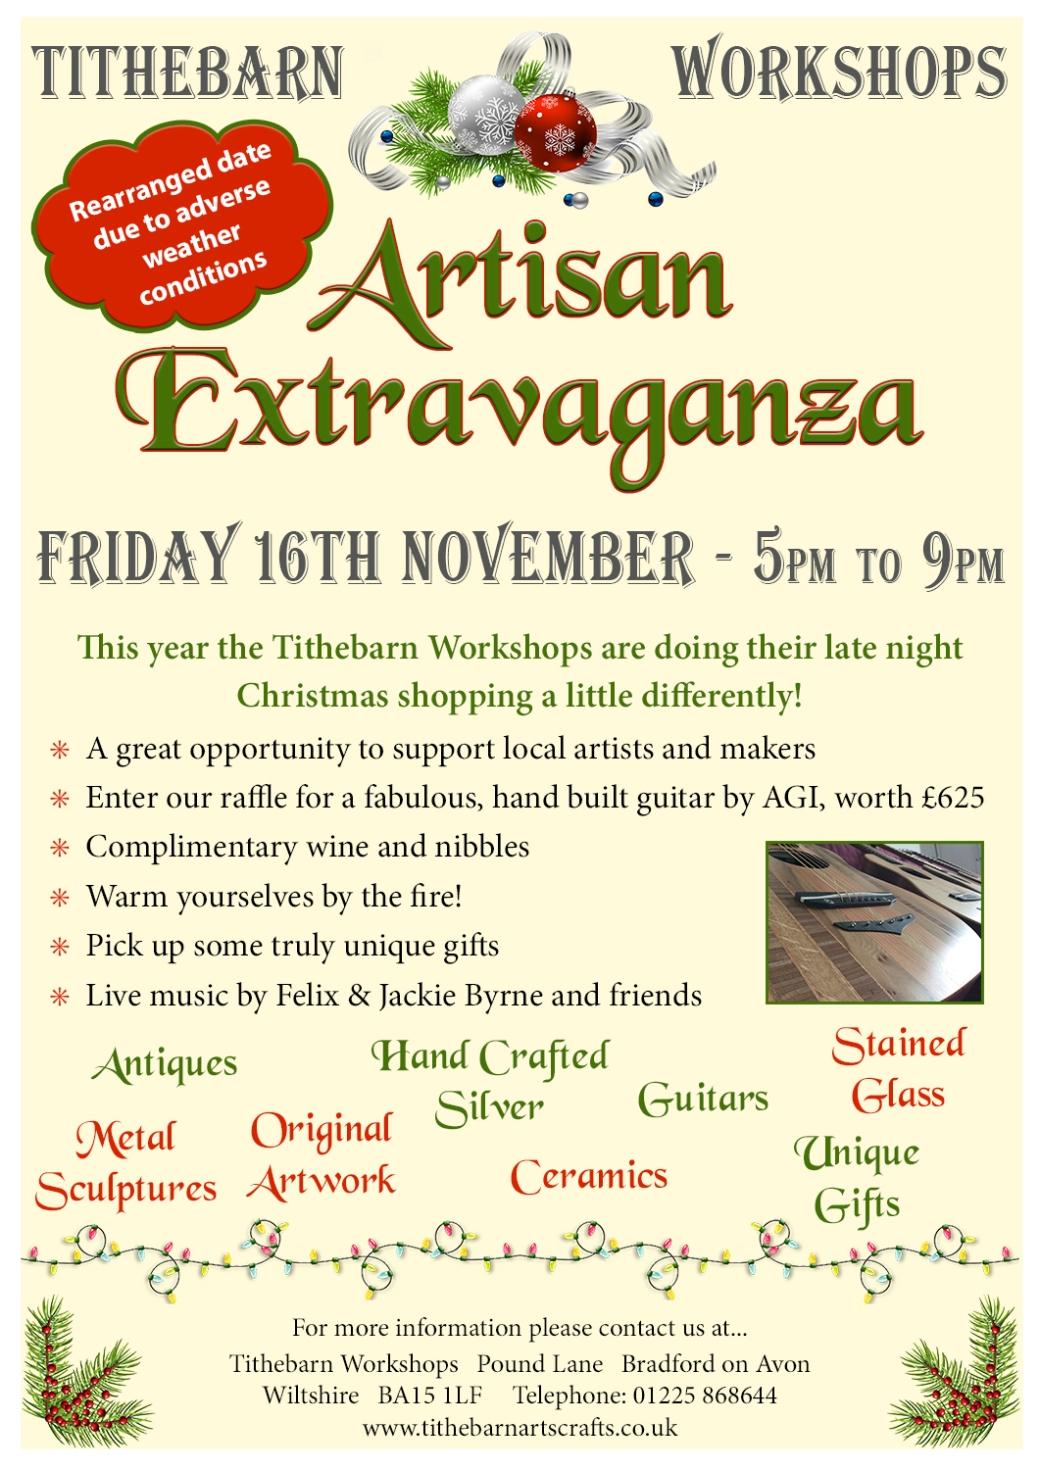 artisan extravaganza tithebarn workshops